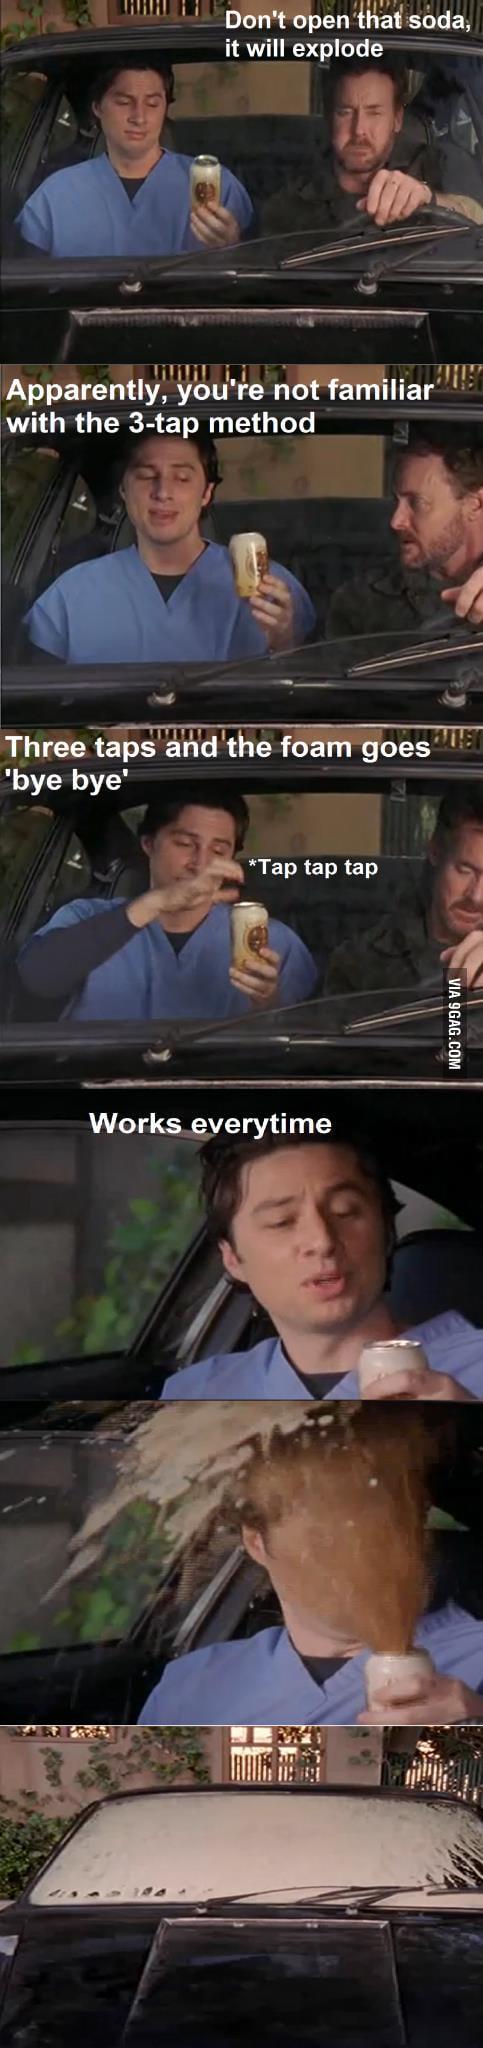 3-tap method